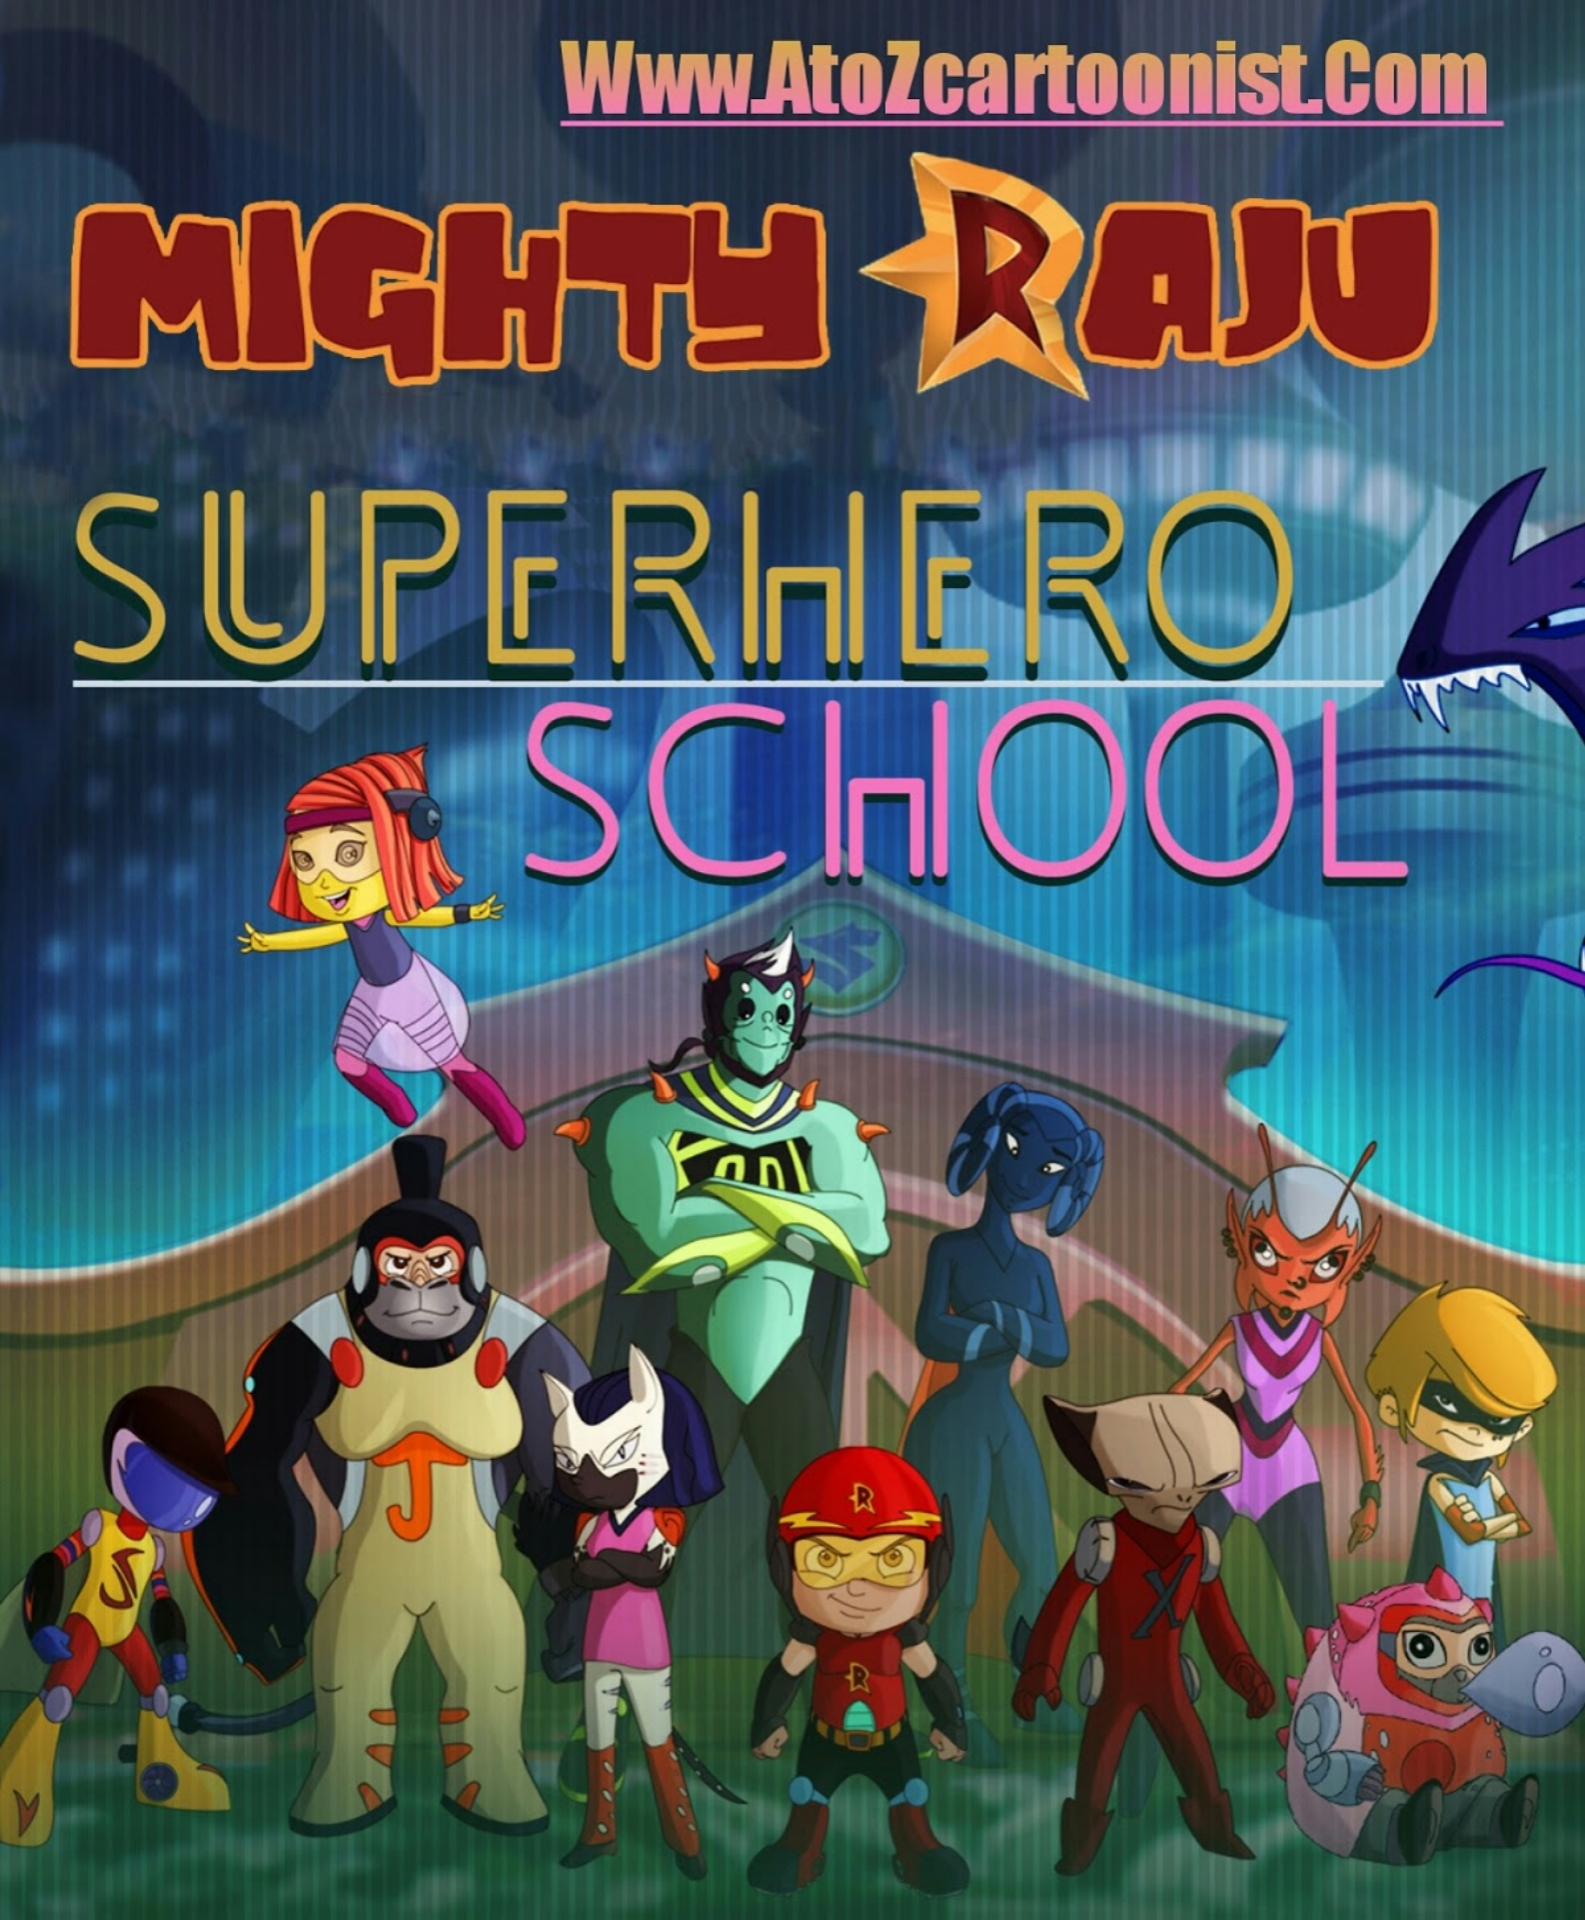 MIGHTY RAJU : SUPERHERO SCHOOL FULL MOVIE IN HINDI DOWNLOAD (720P HD & 1080P FHD)